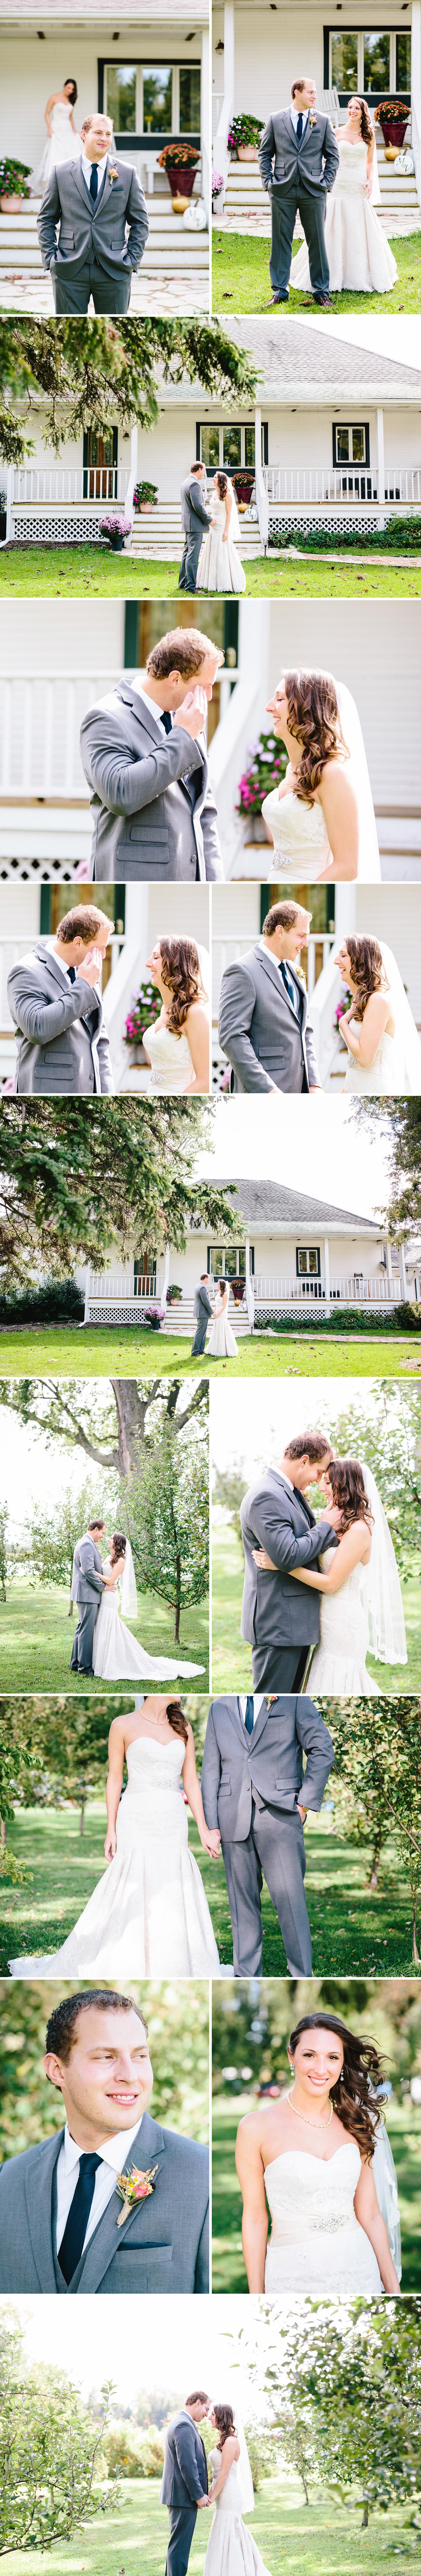 chicago-fine-art-wedding-photography-aloisio1